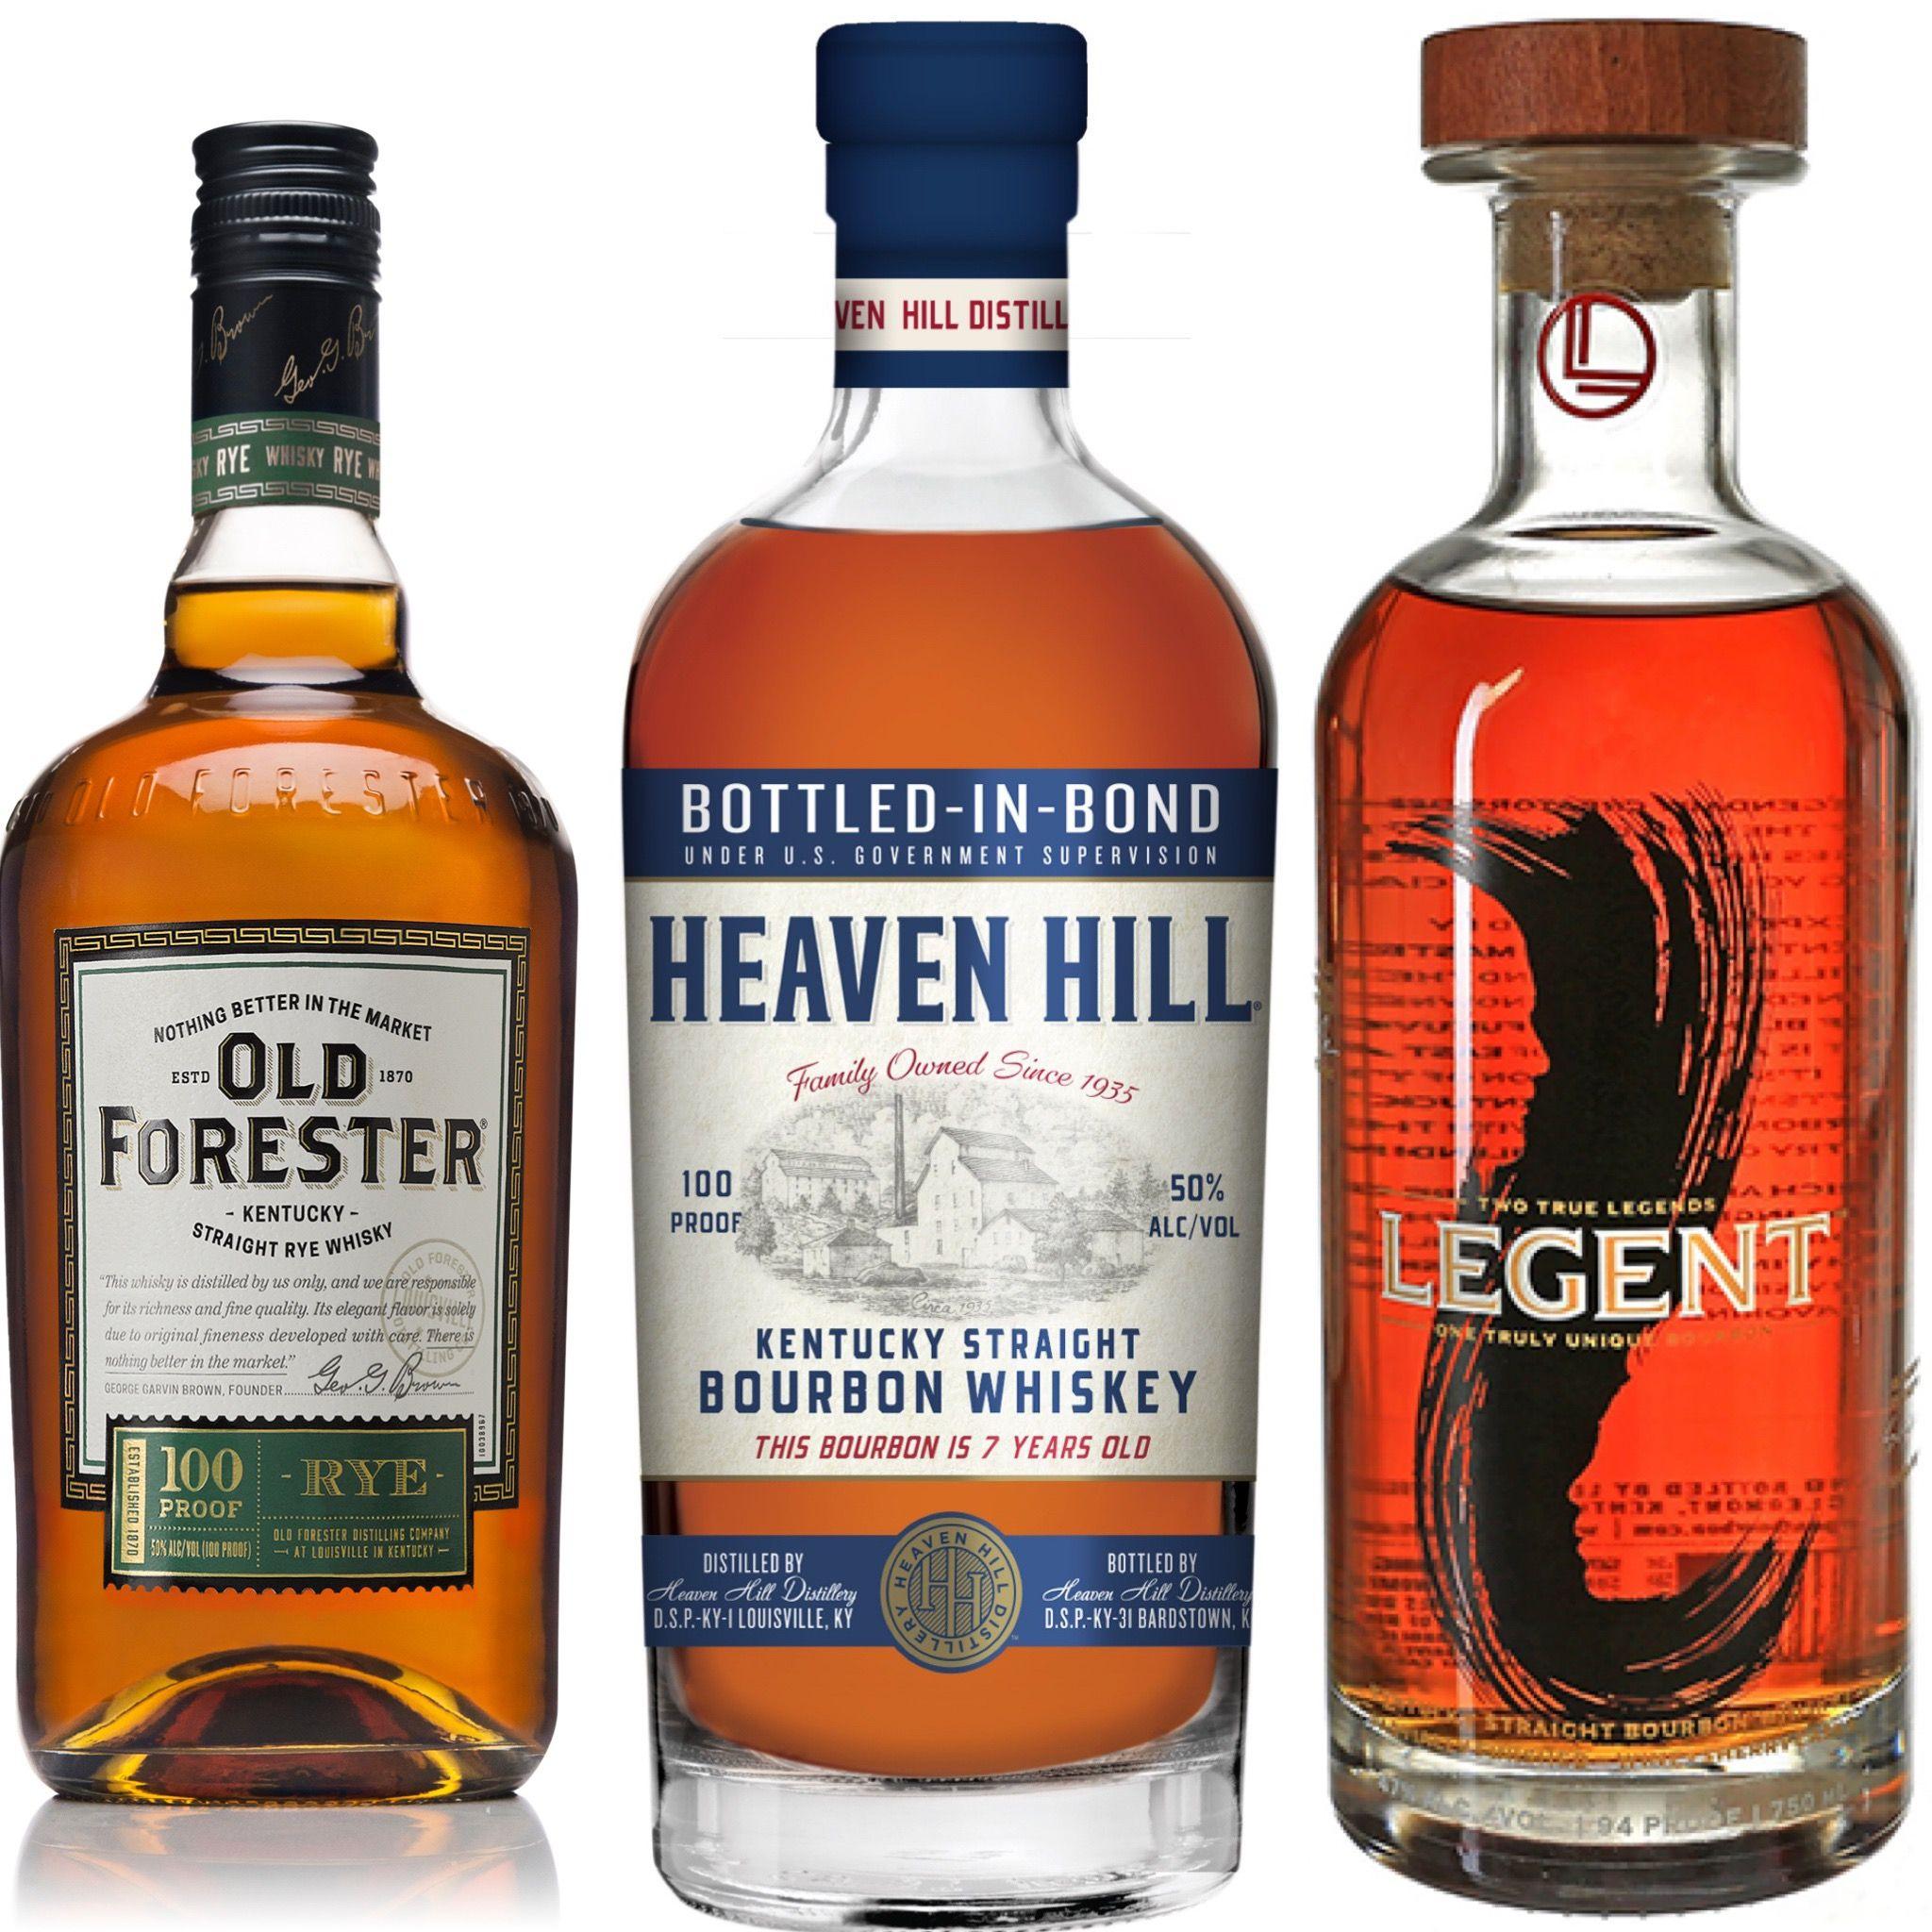 15 New Whiskeys Under 50 To Gift In 2019 Whiskey Good Whiskey Brands Kentucky Whisky